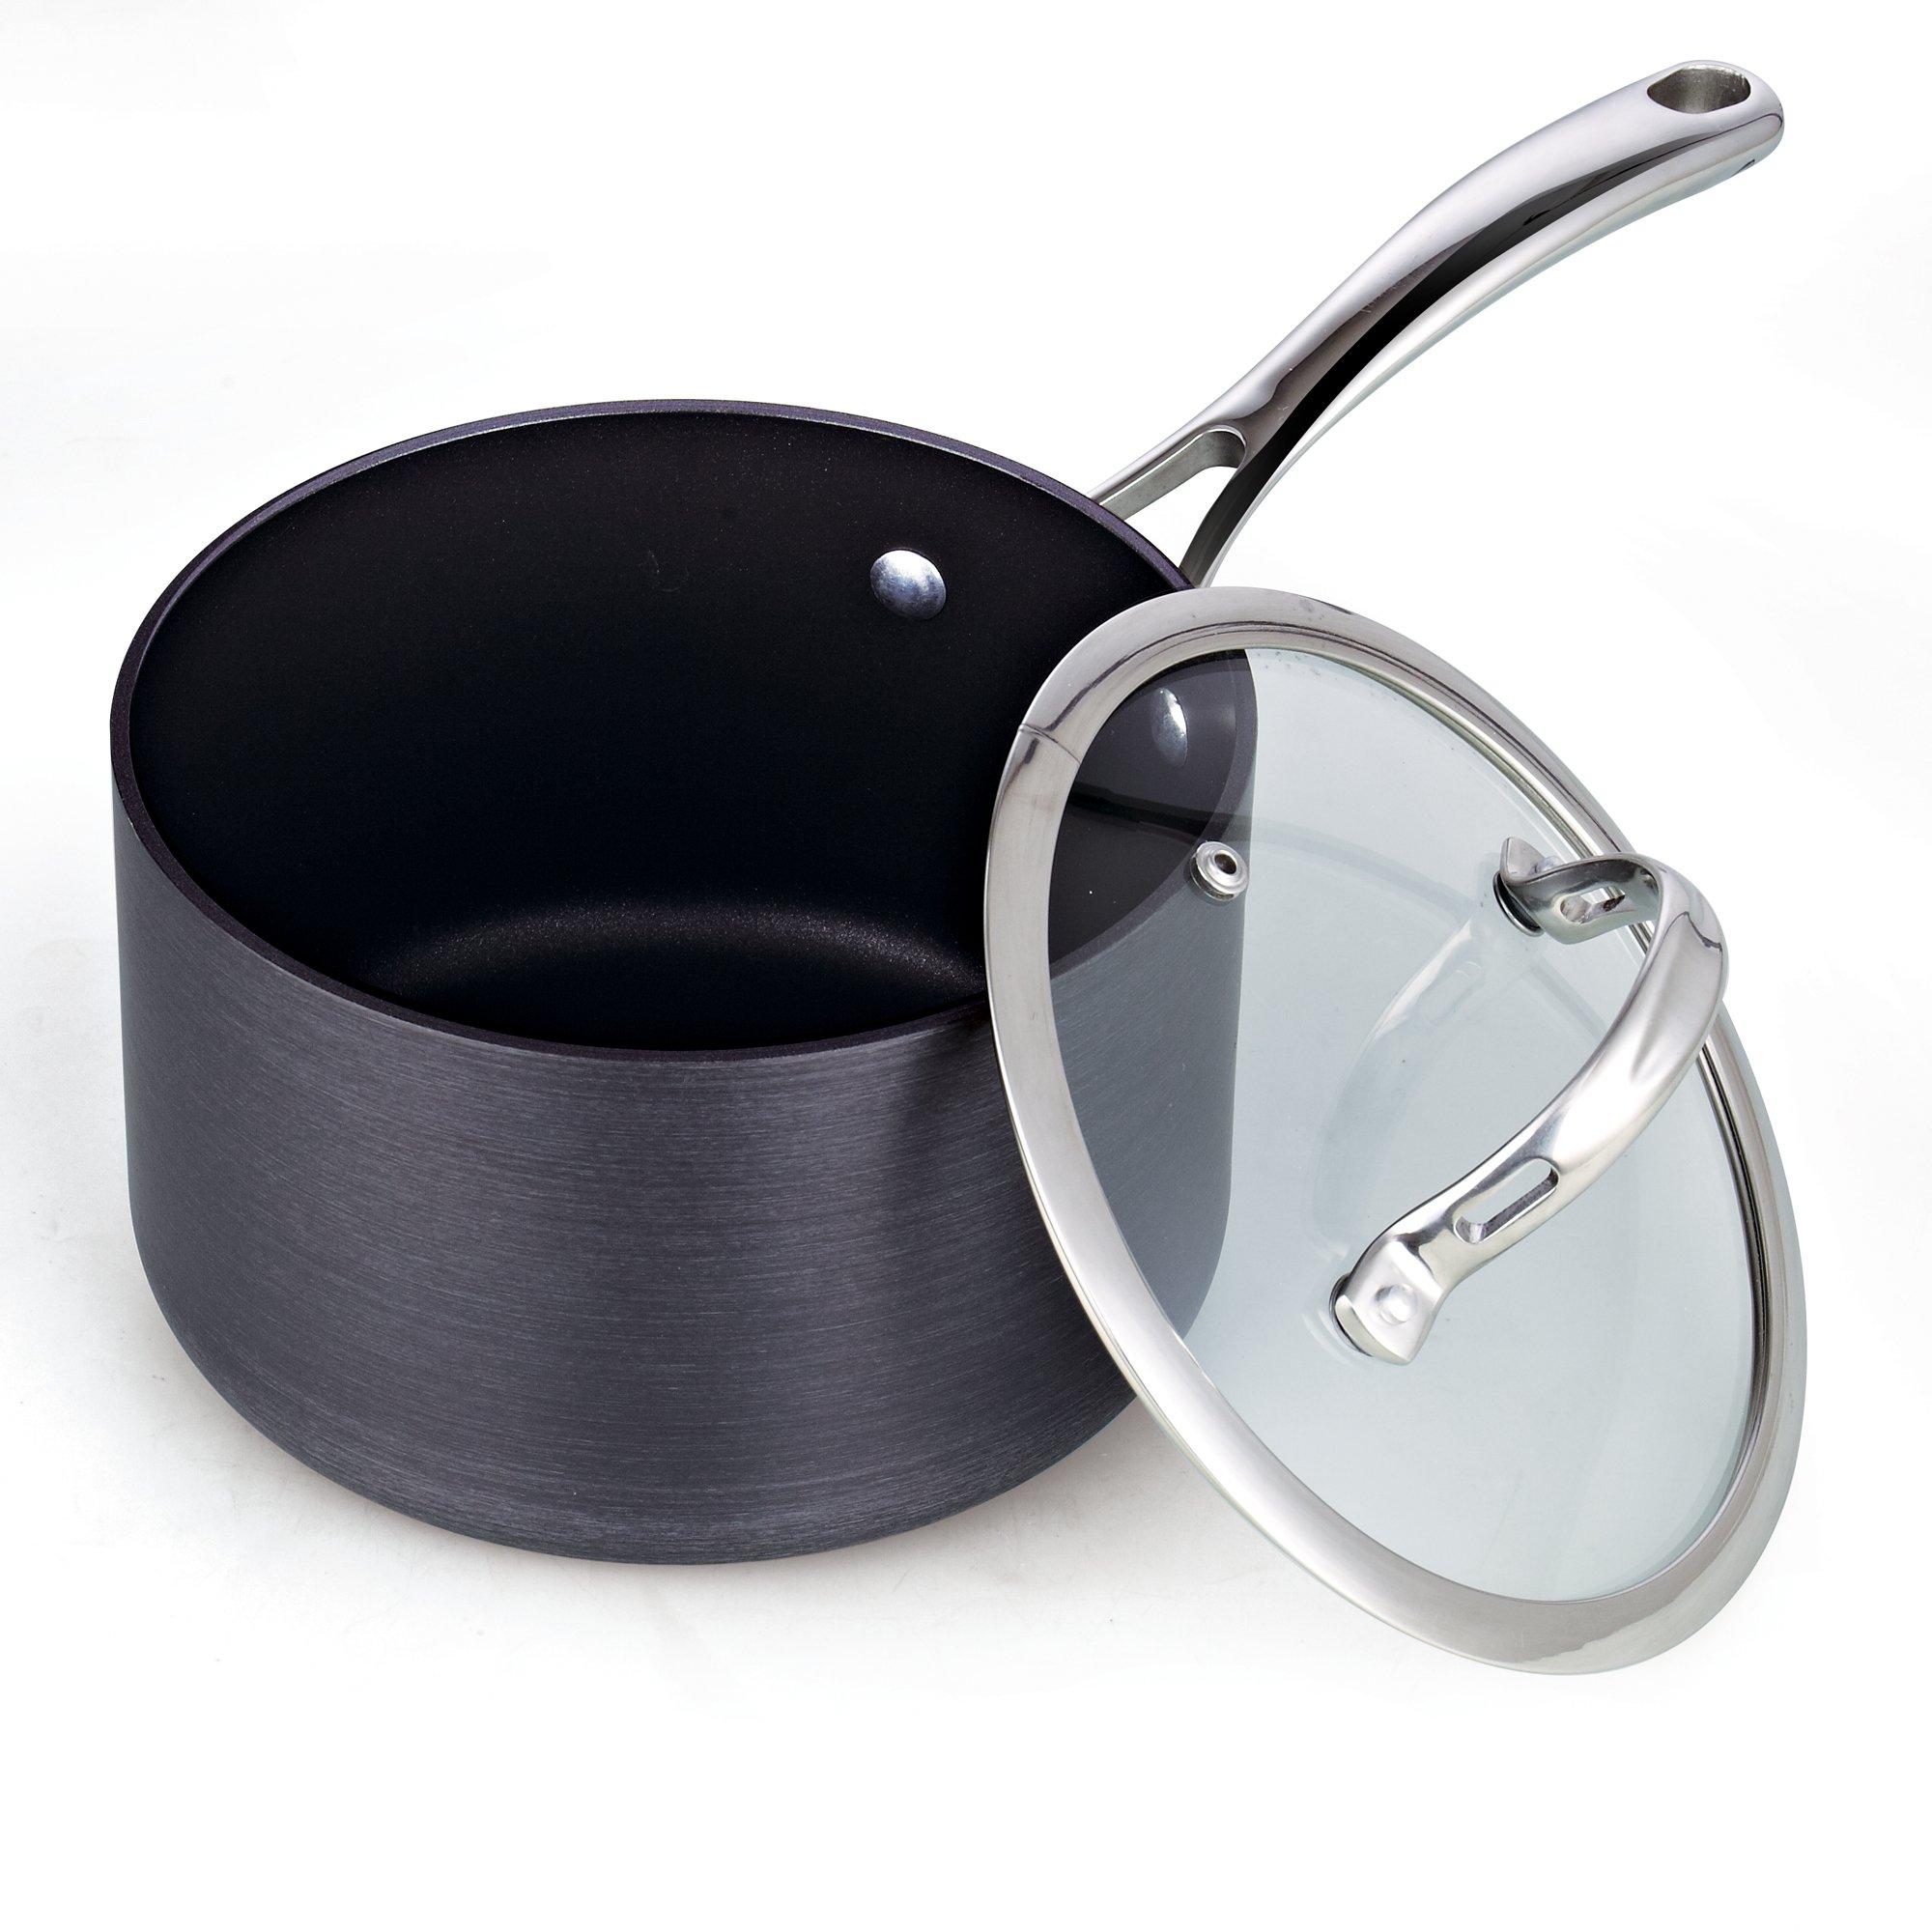 Cooks Standard 3-Quart Hard Anodized Nonstick Saucepan with Lid, Black